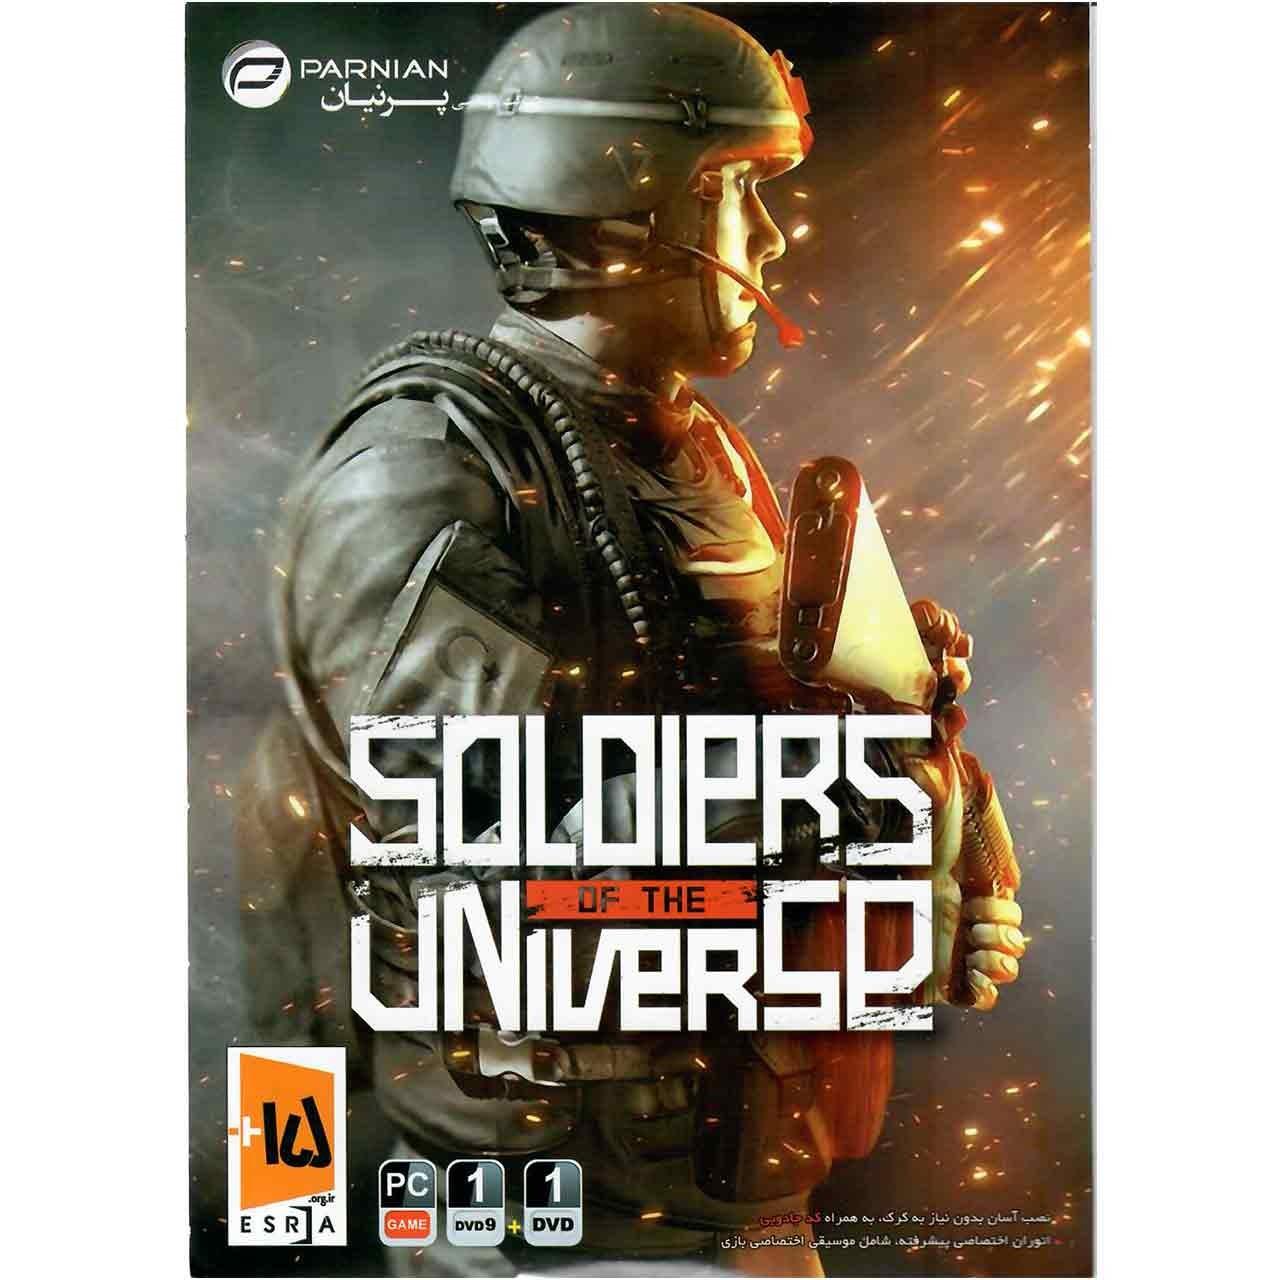 بازی Soldiers of the Universe  مخصوص کامپیوتر